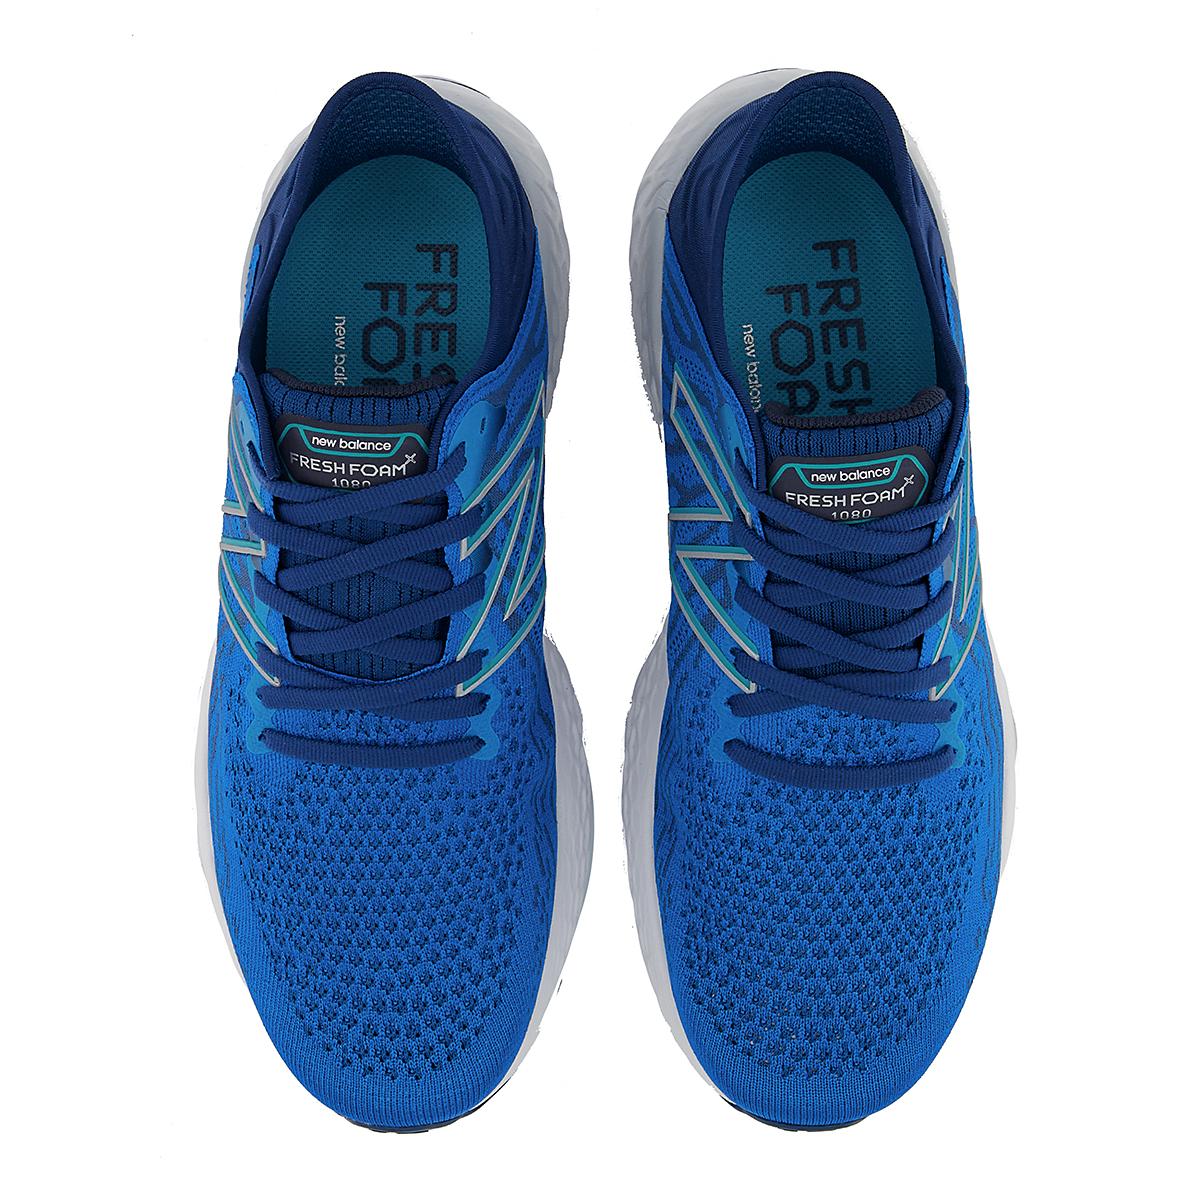 Men's New Balance Fresh Foam 1080v11 Running Shoe - Color: Wave/Light Rogue Wave - Size: 6 - Width: Wide, Wave/Light Rogue Wave, large, image 5